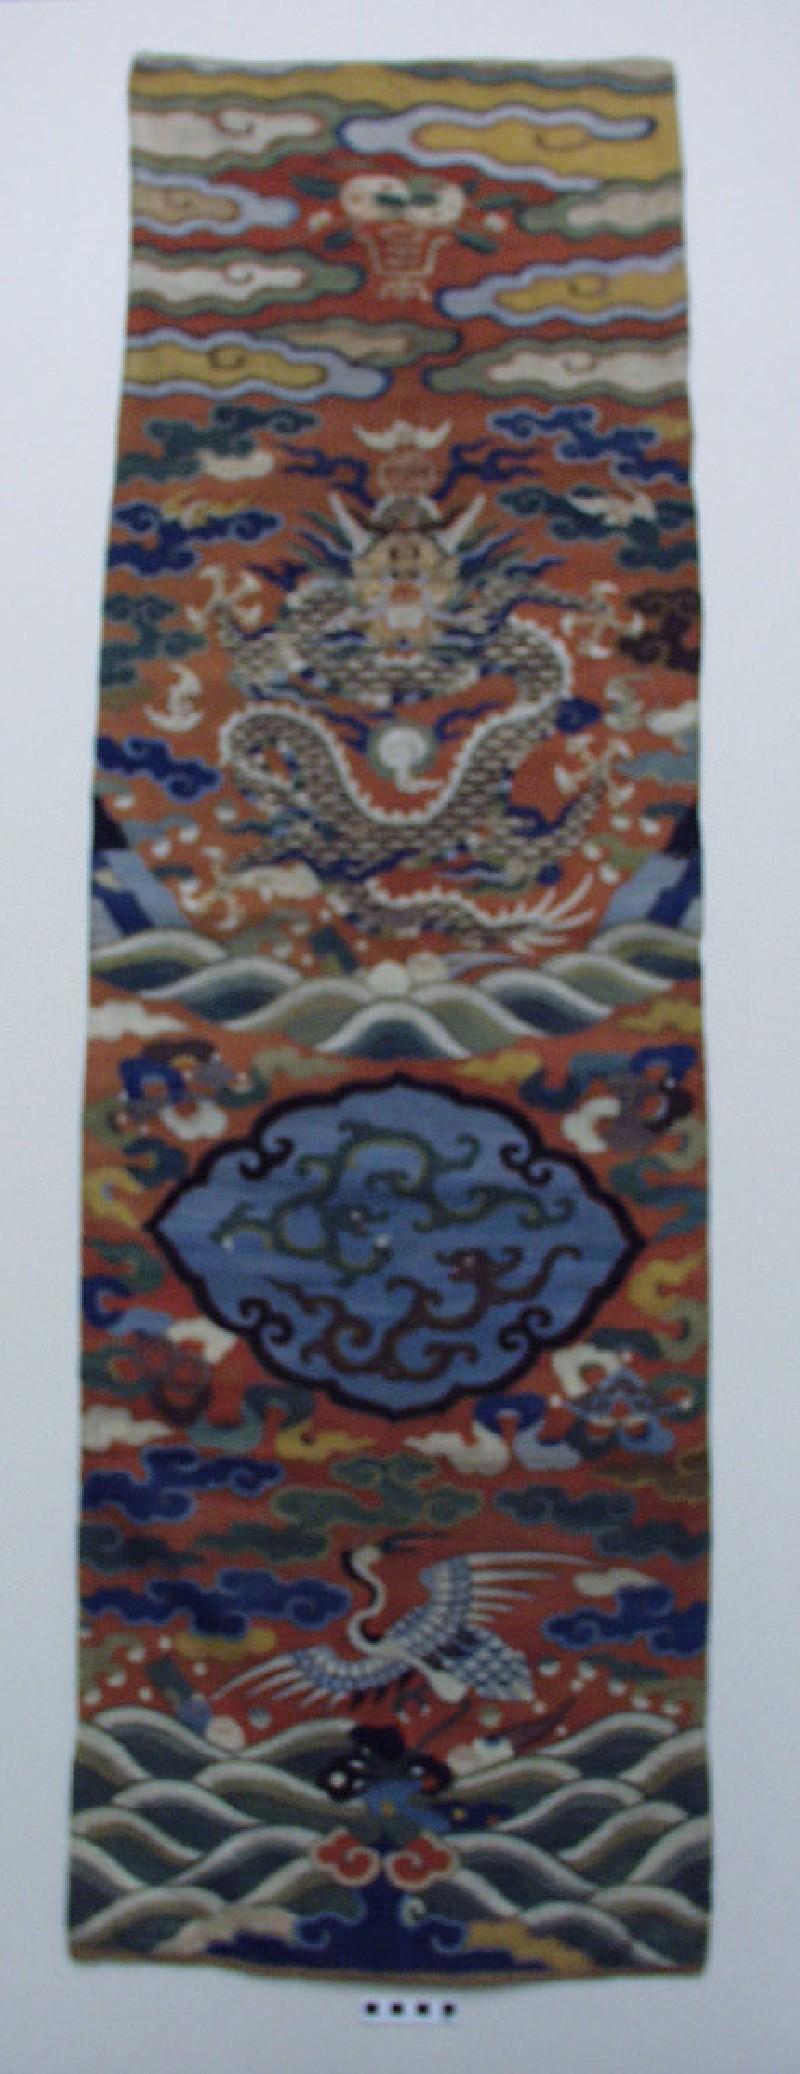 Kesi (k'o-ssu) tapestry chair panels